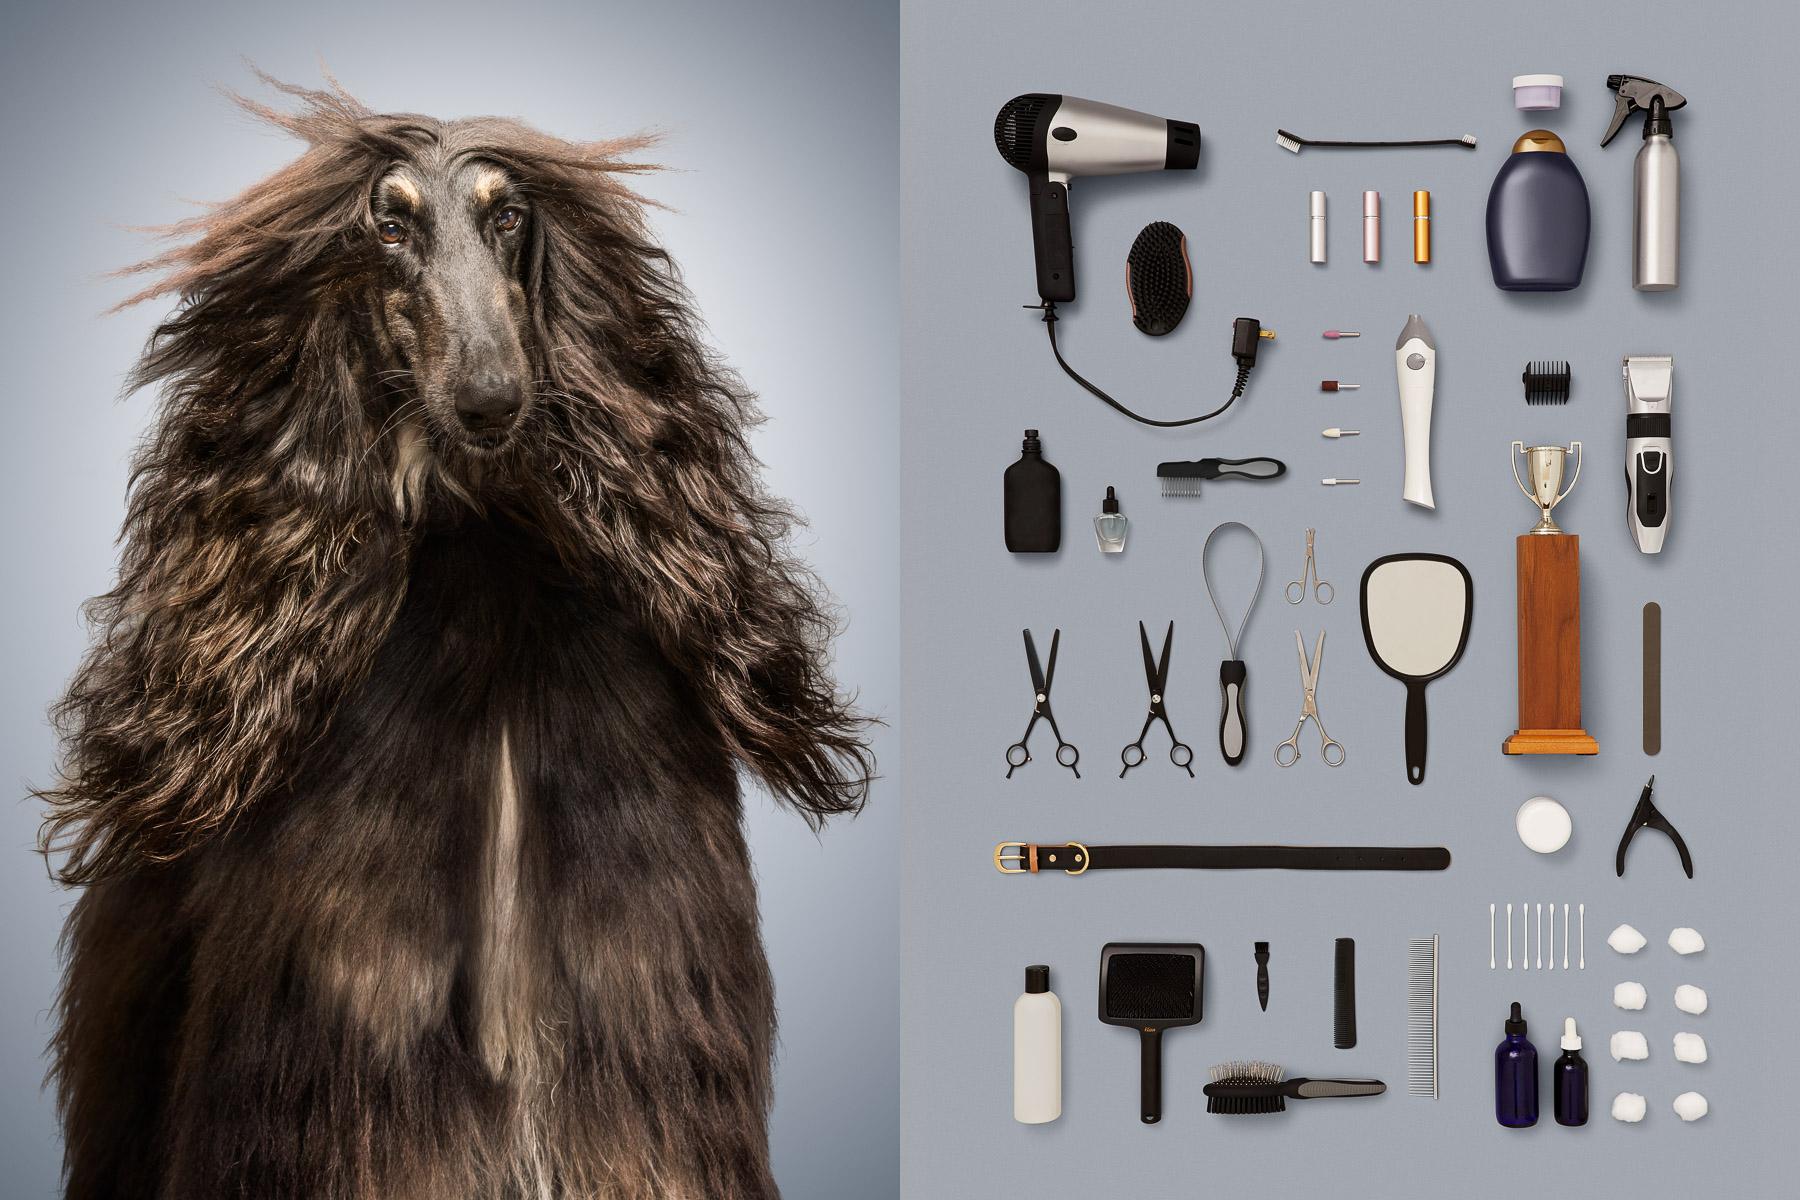 Best-in-show-dog-afghan-hound-portrait-elegant-knolling-pet-grooming-items.jpg